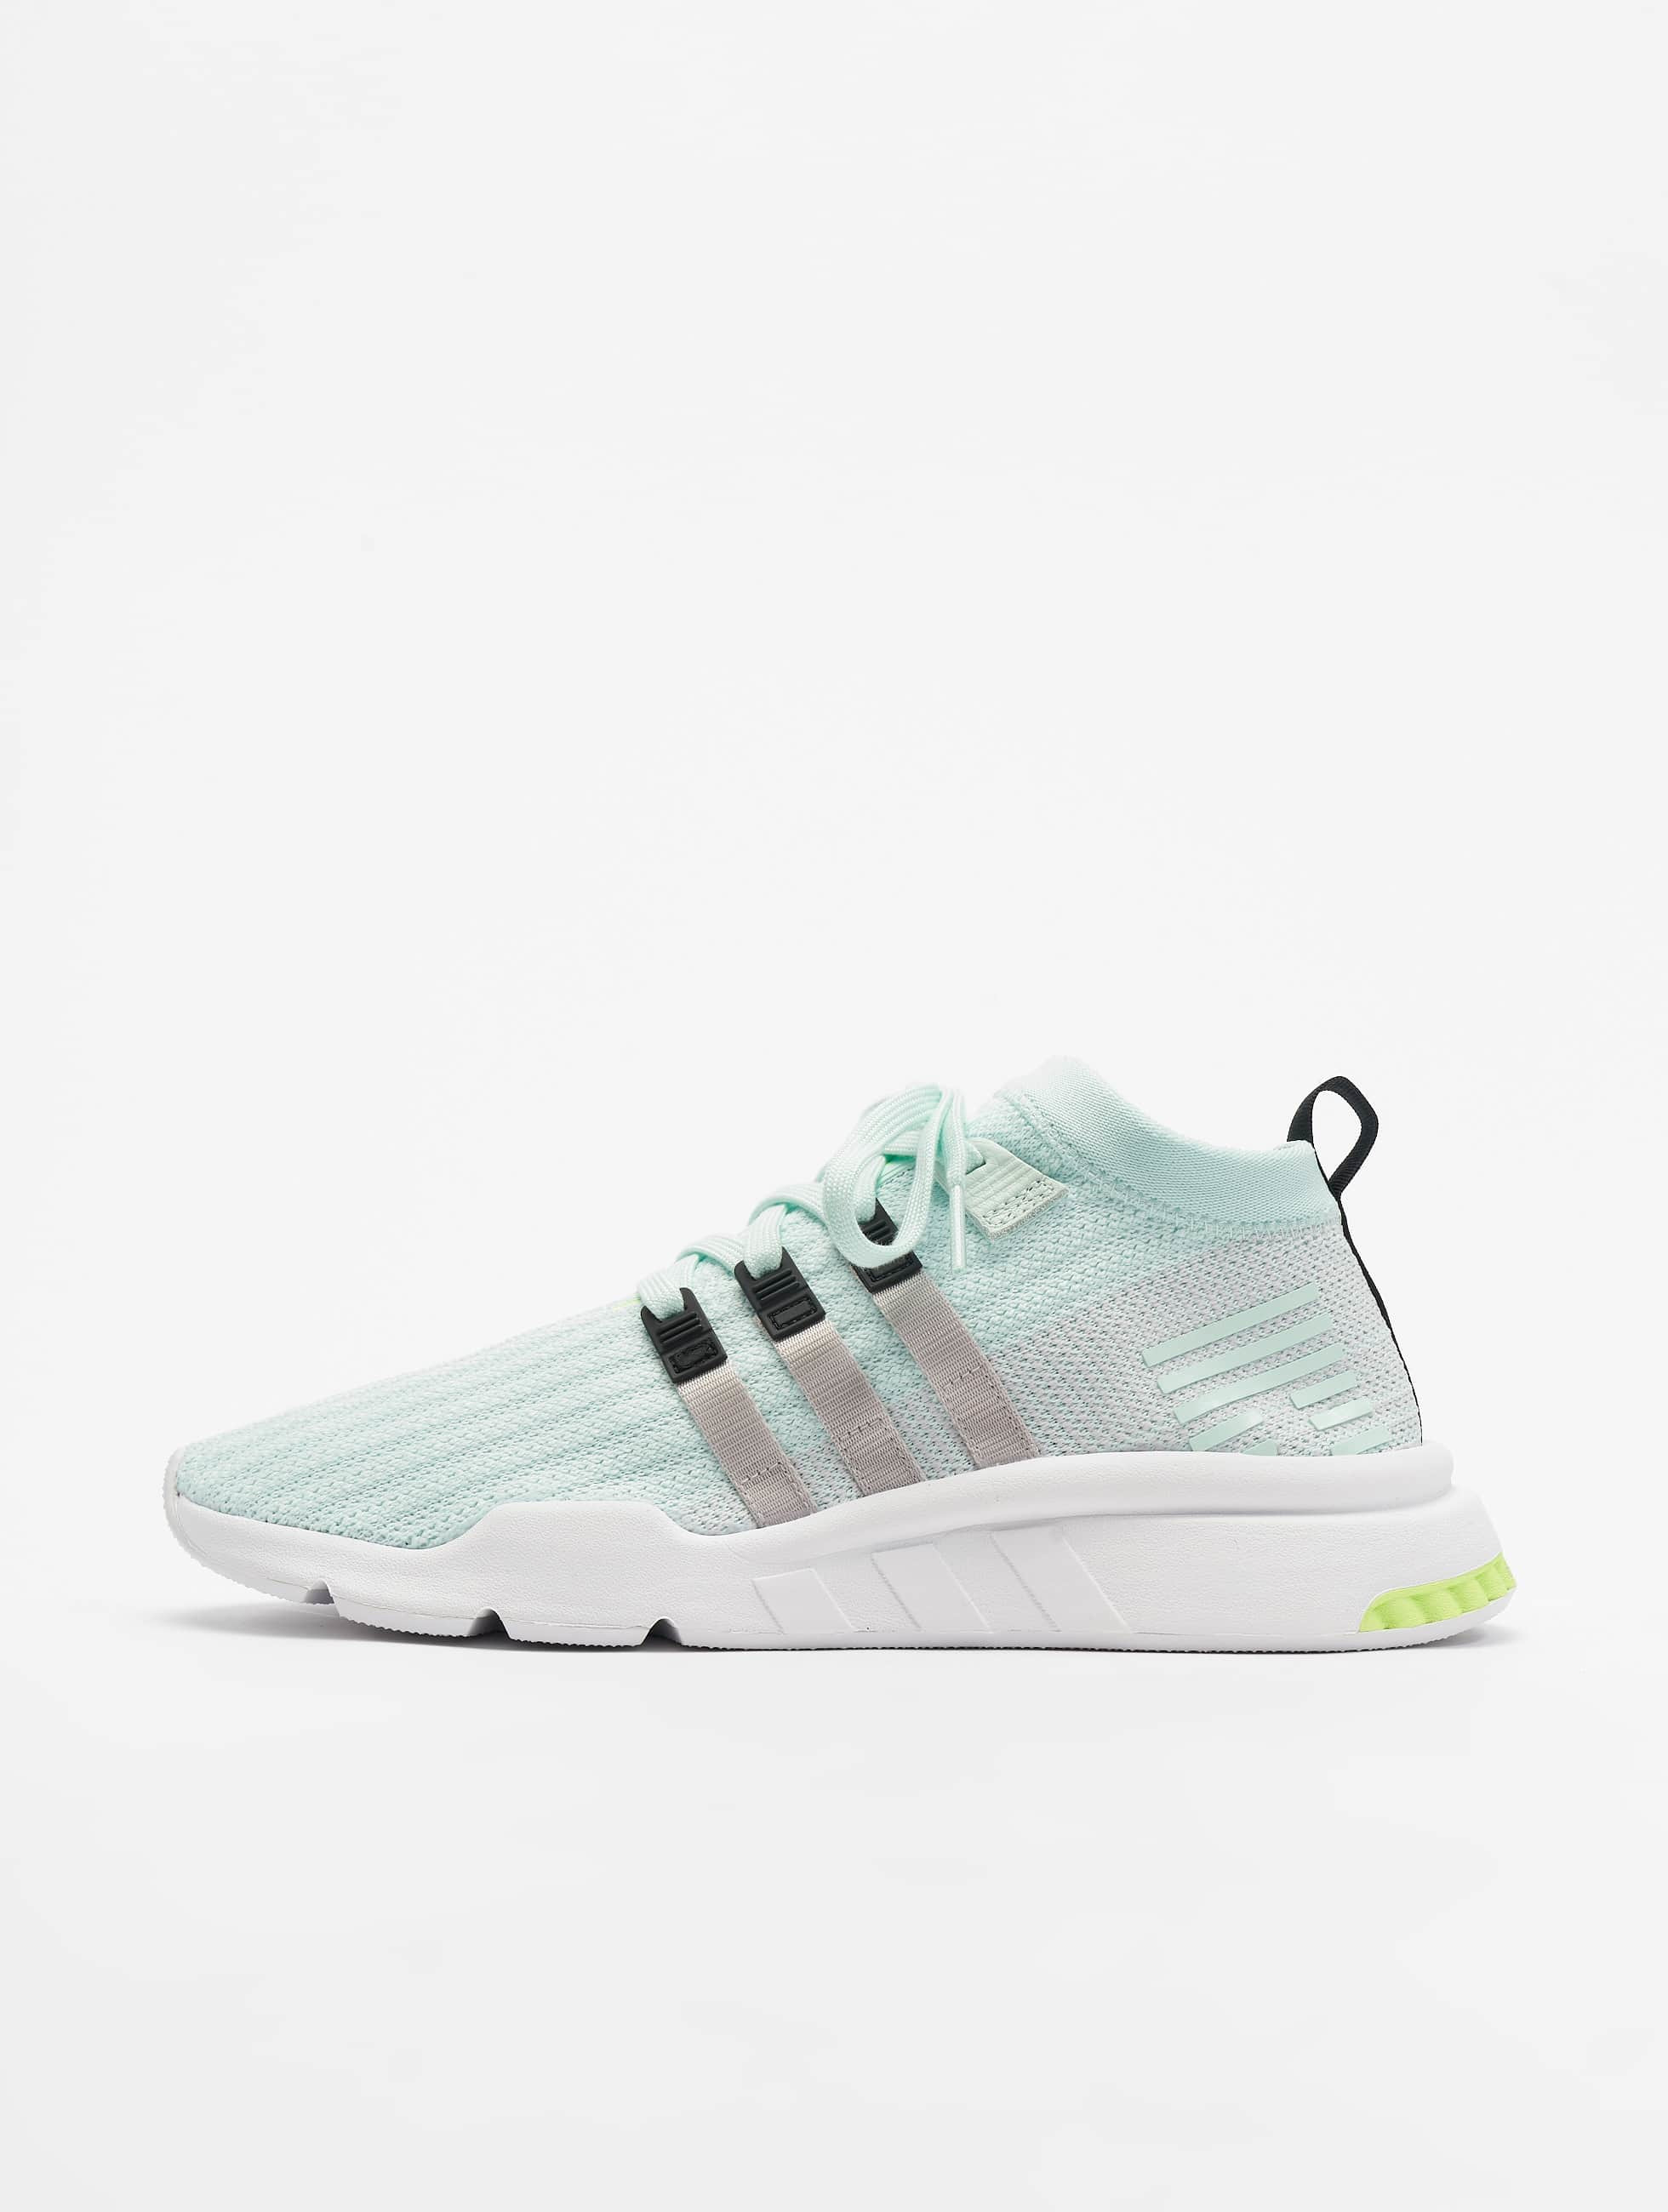 41 Adidas Hommes Eqt Support Adv Core Noir & Blanc Chaussure